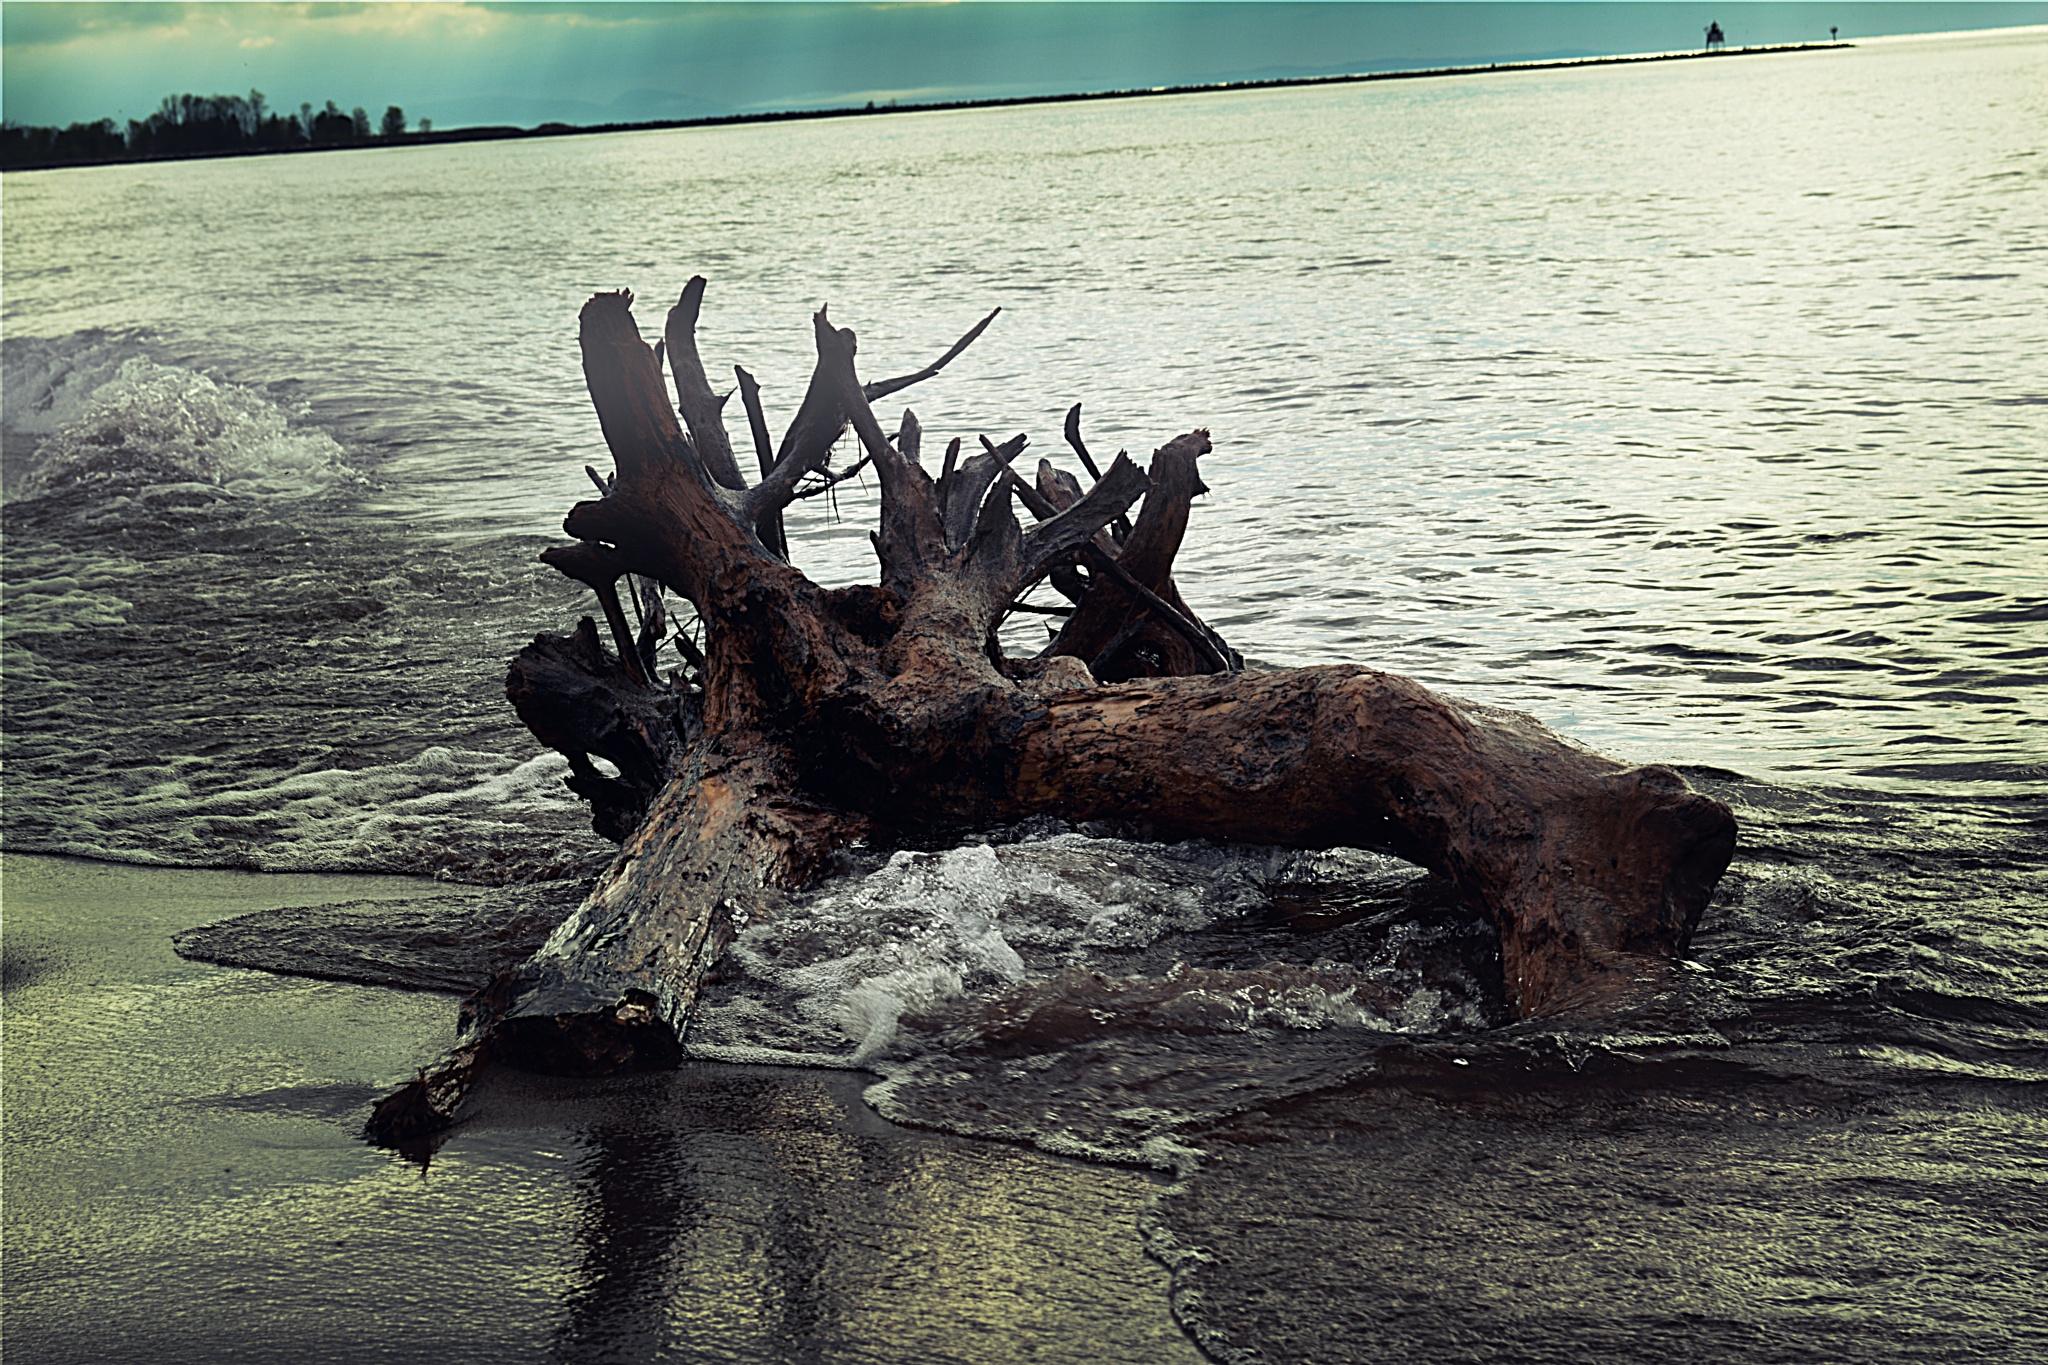 On the Beach by Gena Koelker